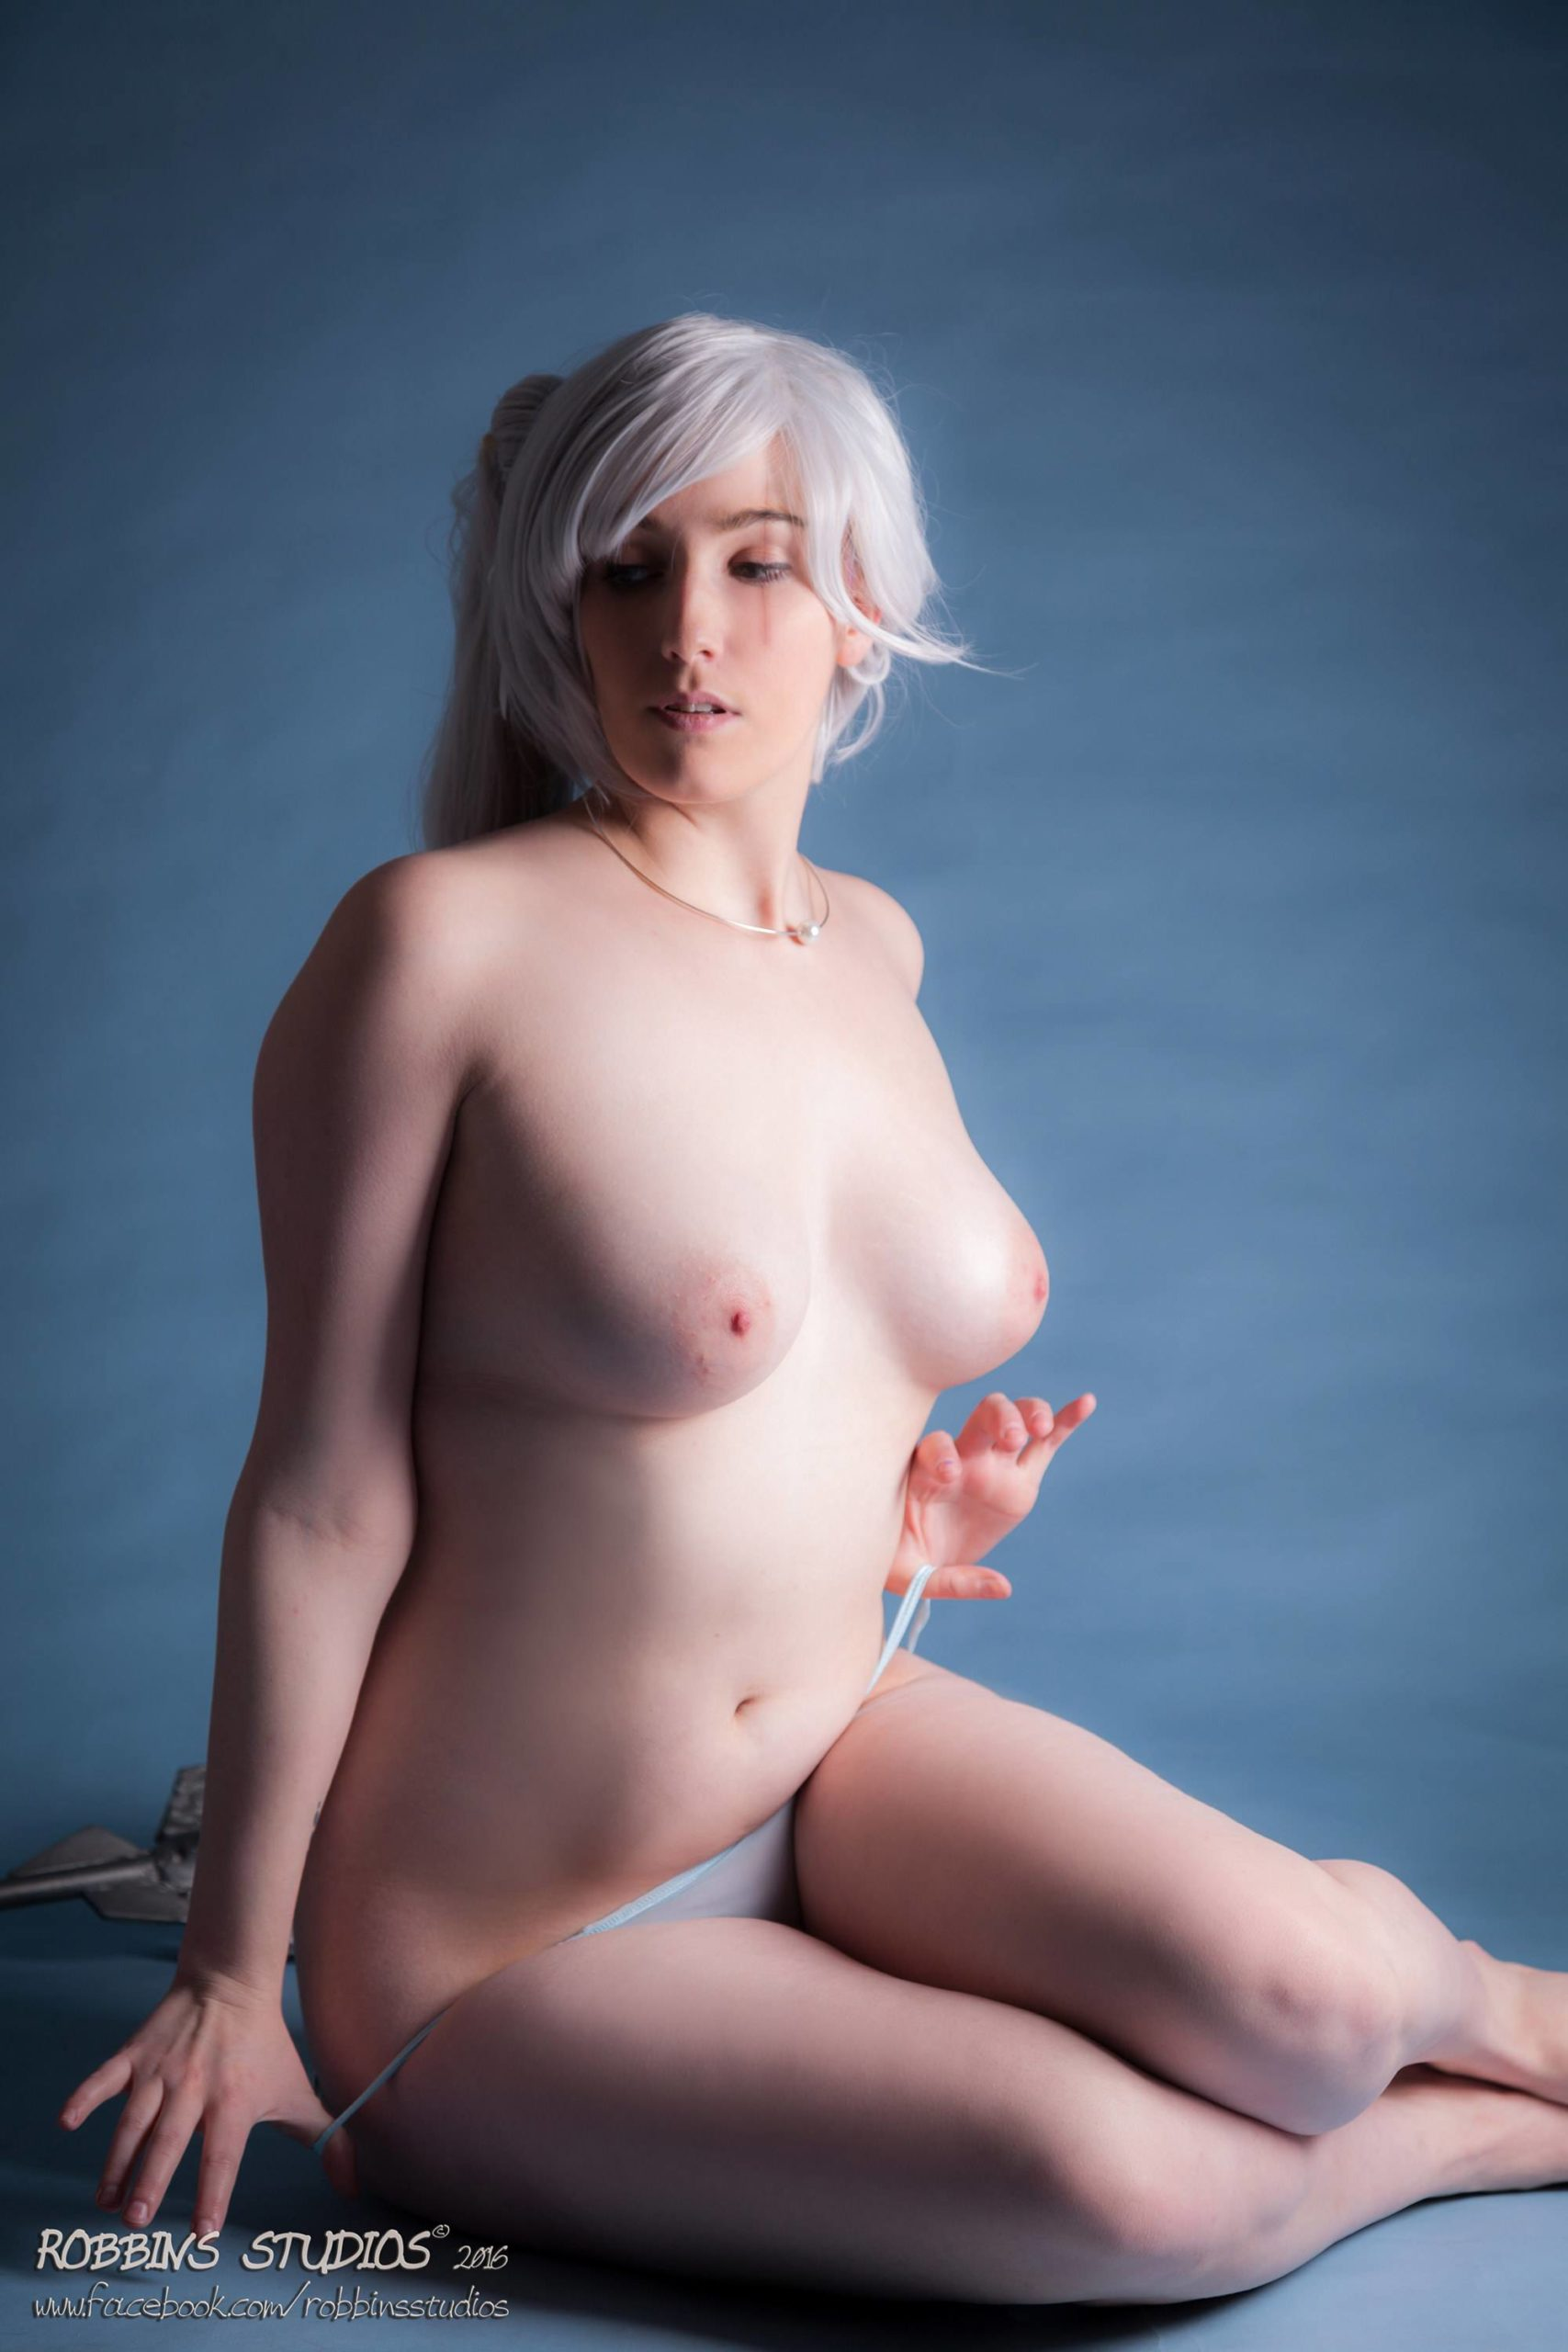 Microkitty Patreon Nude Photos Leaks 0005